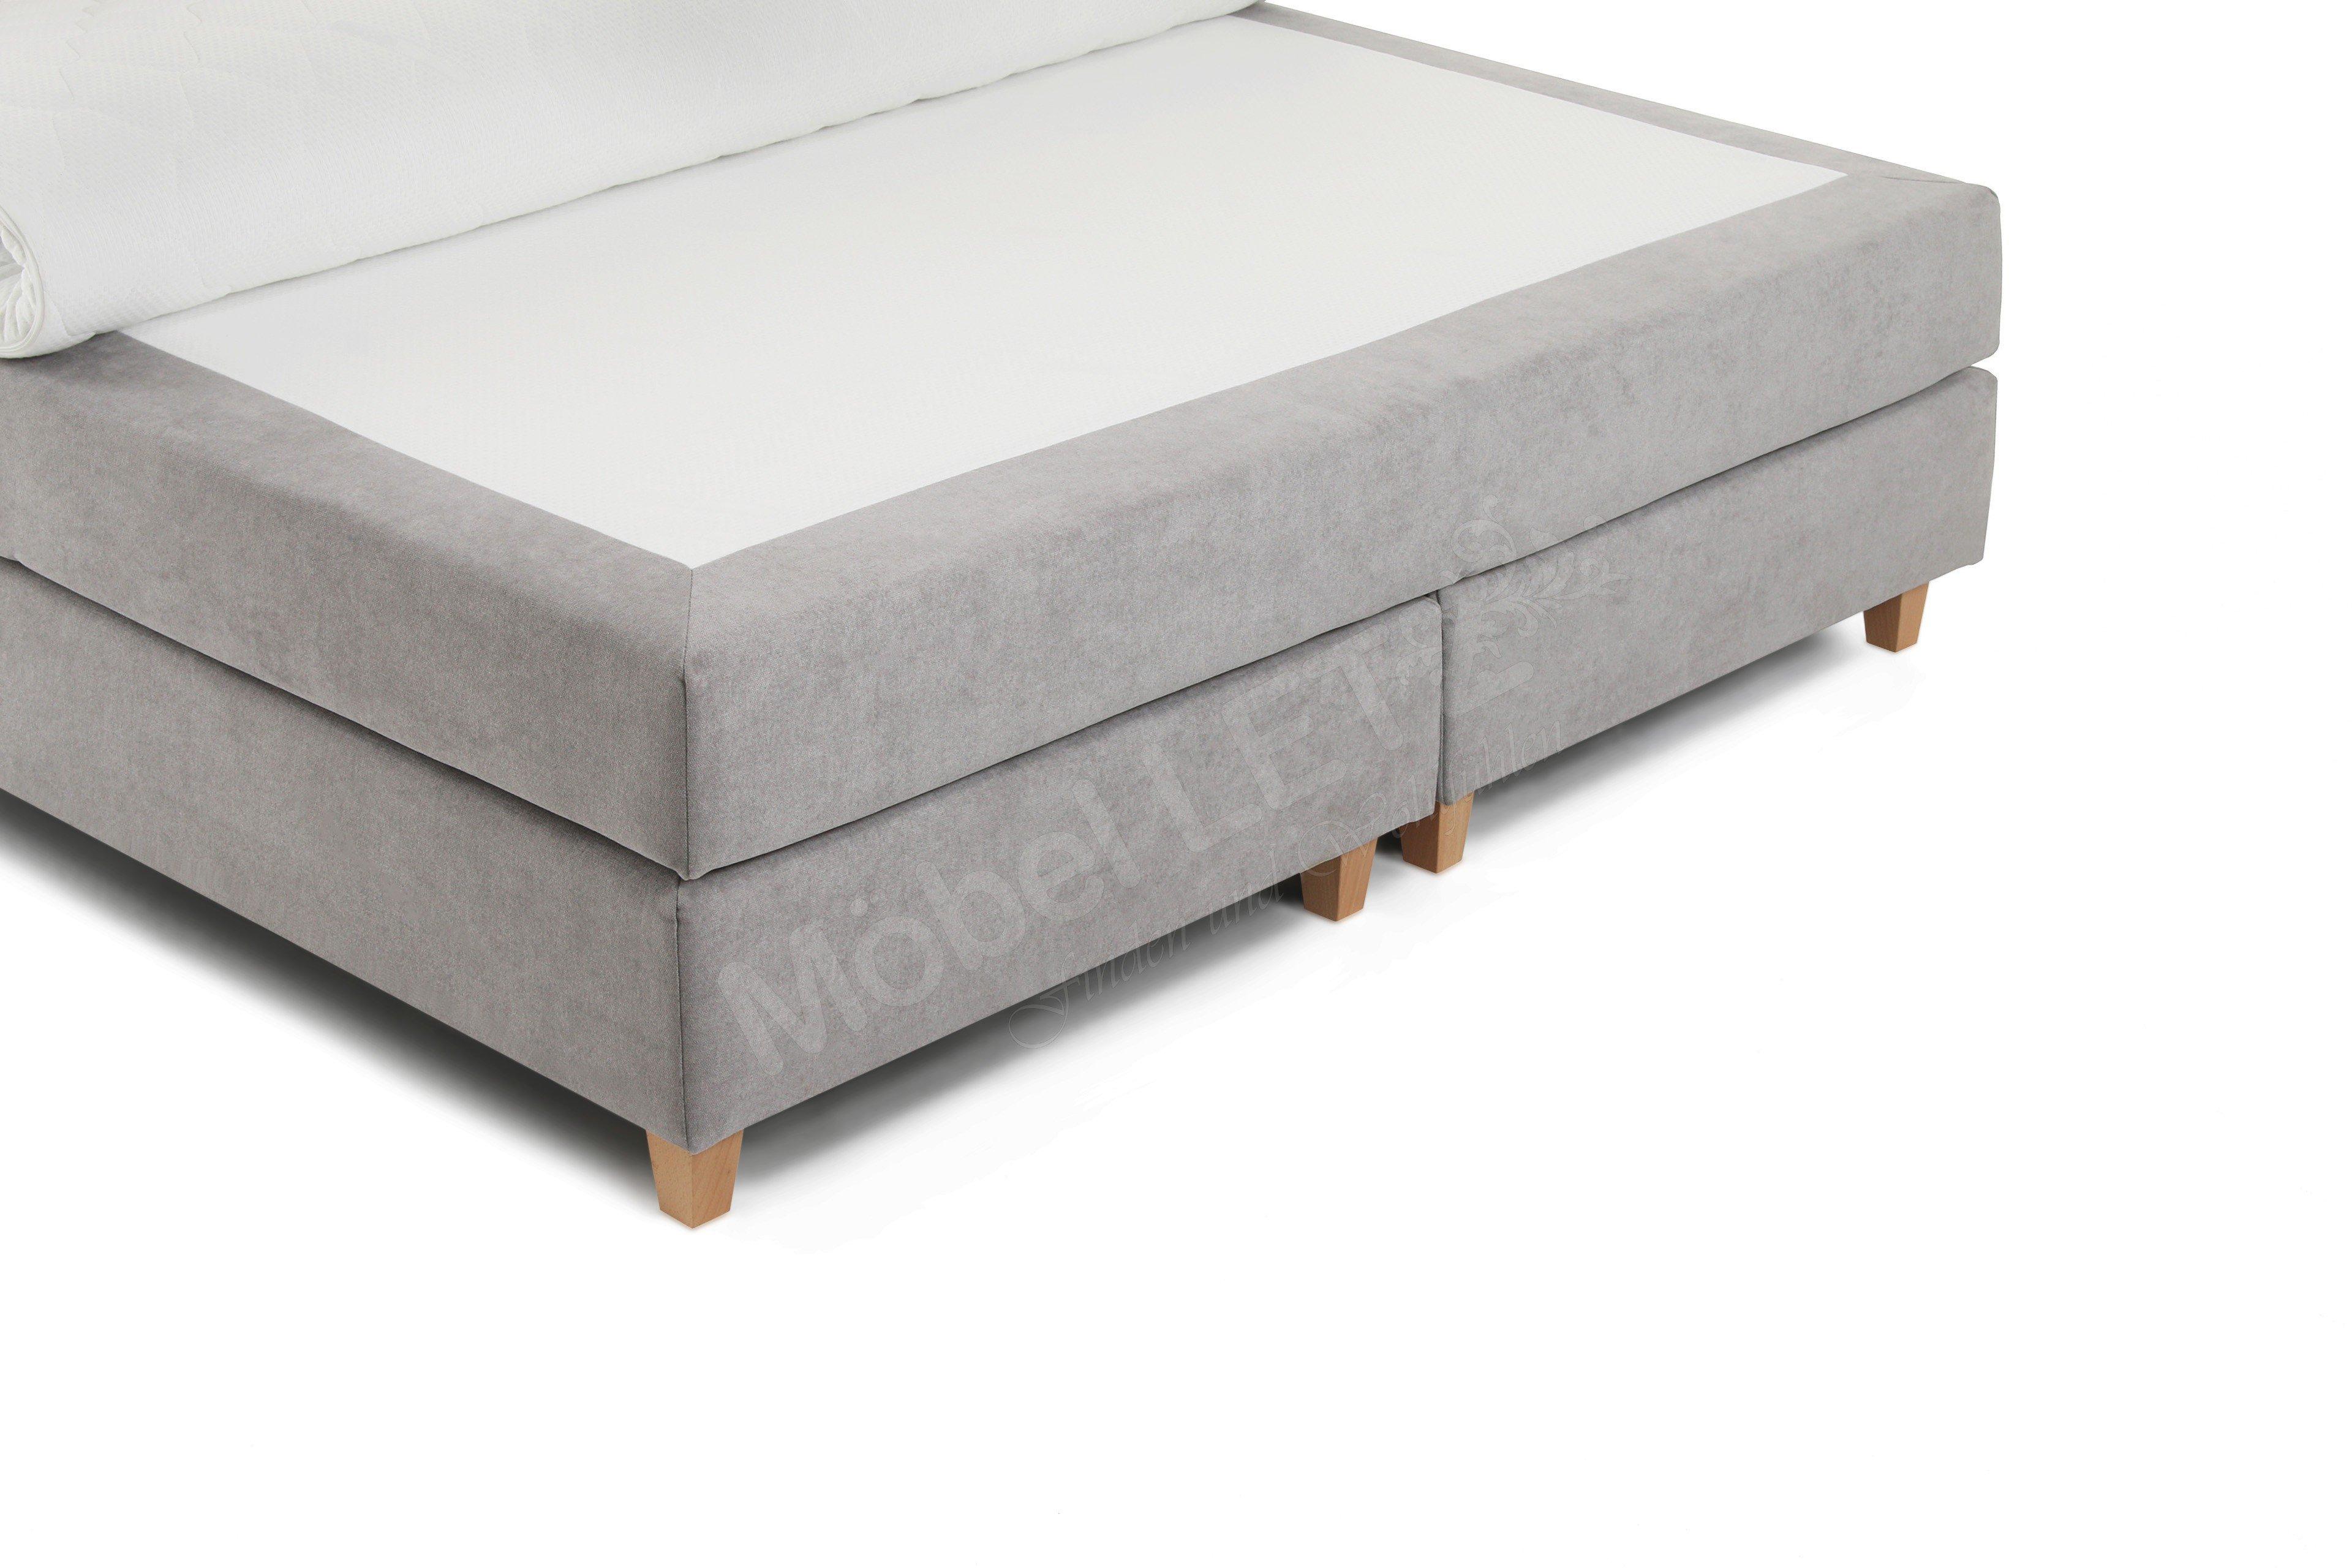 skandinavische m bel boxspringbett janno in hellgrau mit. Black Bedroom Furniture Sets. Home Design Ideas